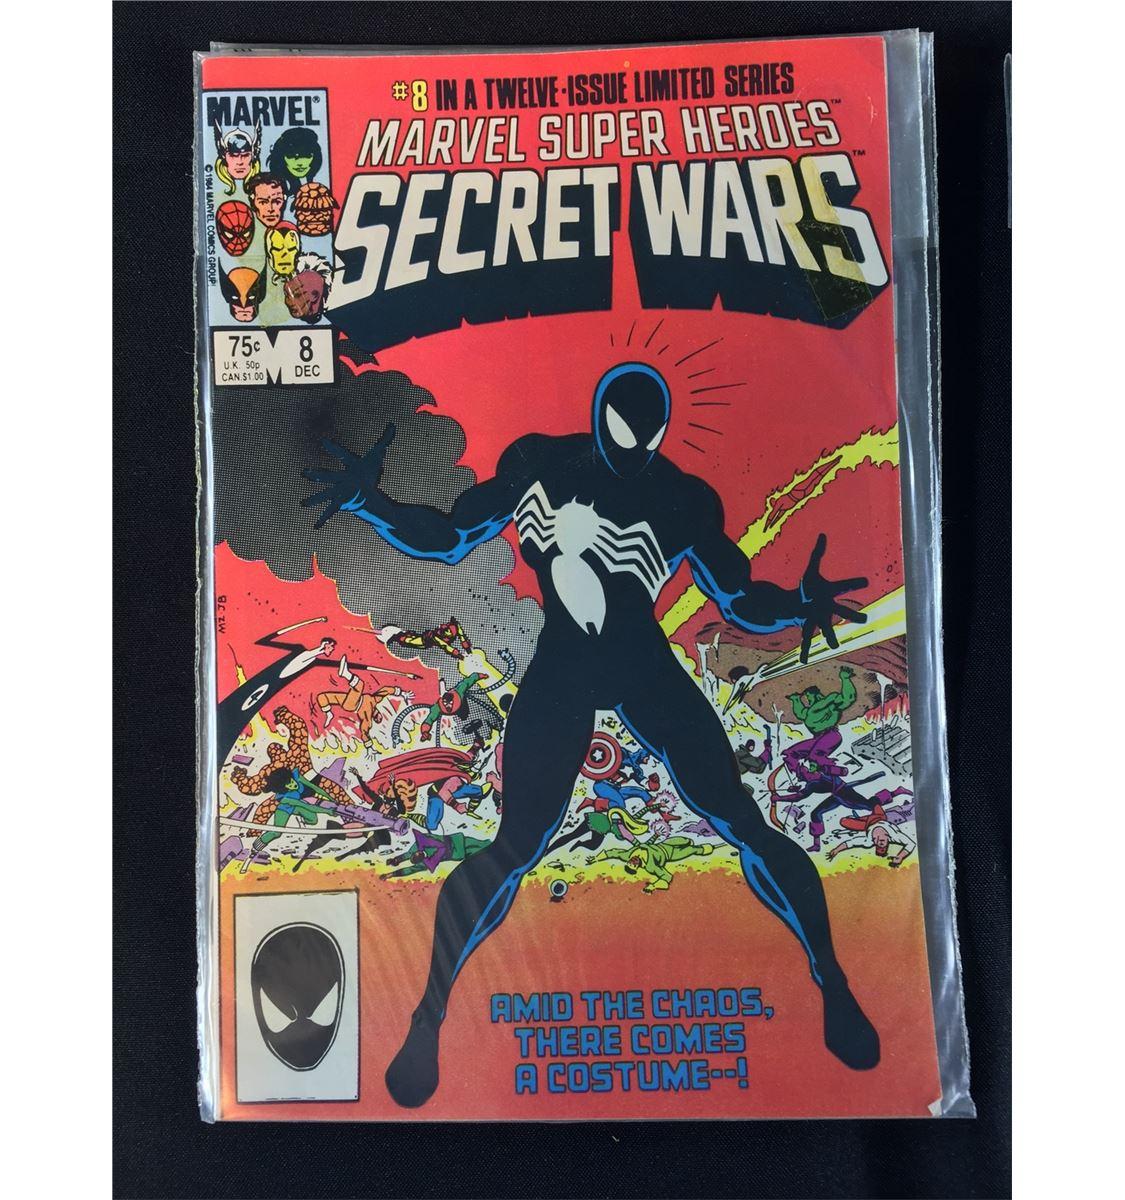 SECRET WARS #1-12 (1984-85) MARVEL'S CLASSIC 80'S MINI SERIES  COMPLETE  SET  #8-1ST BLACK SPIDEY